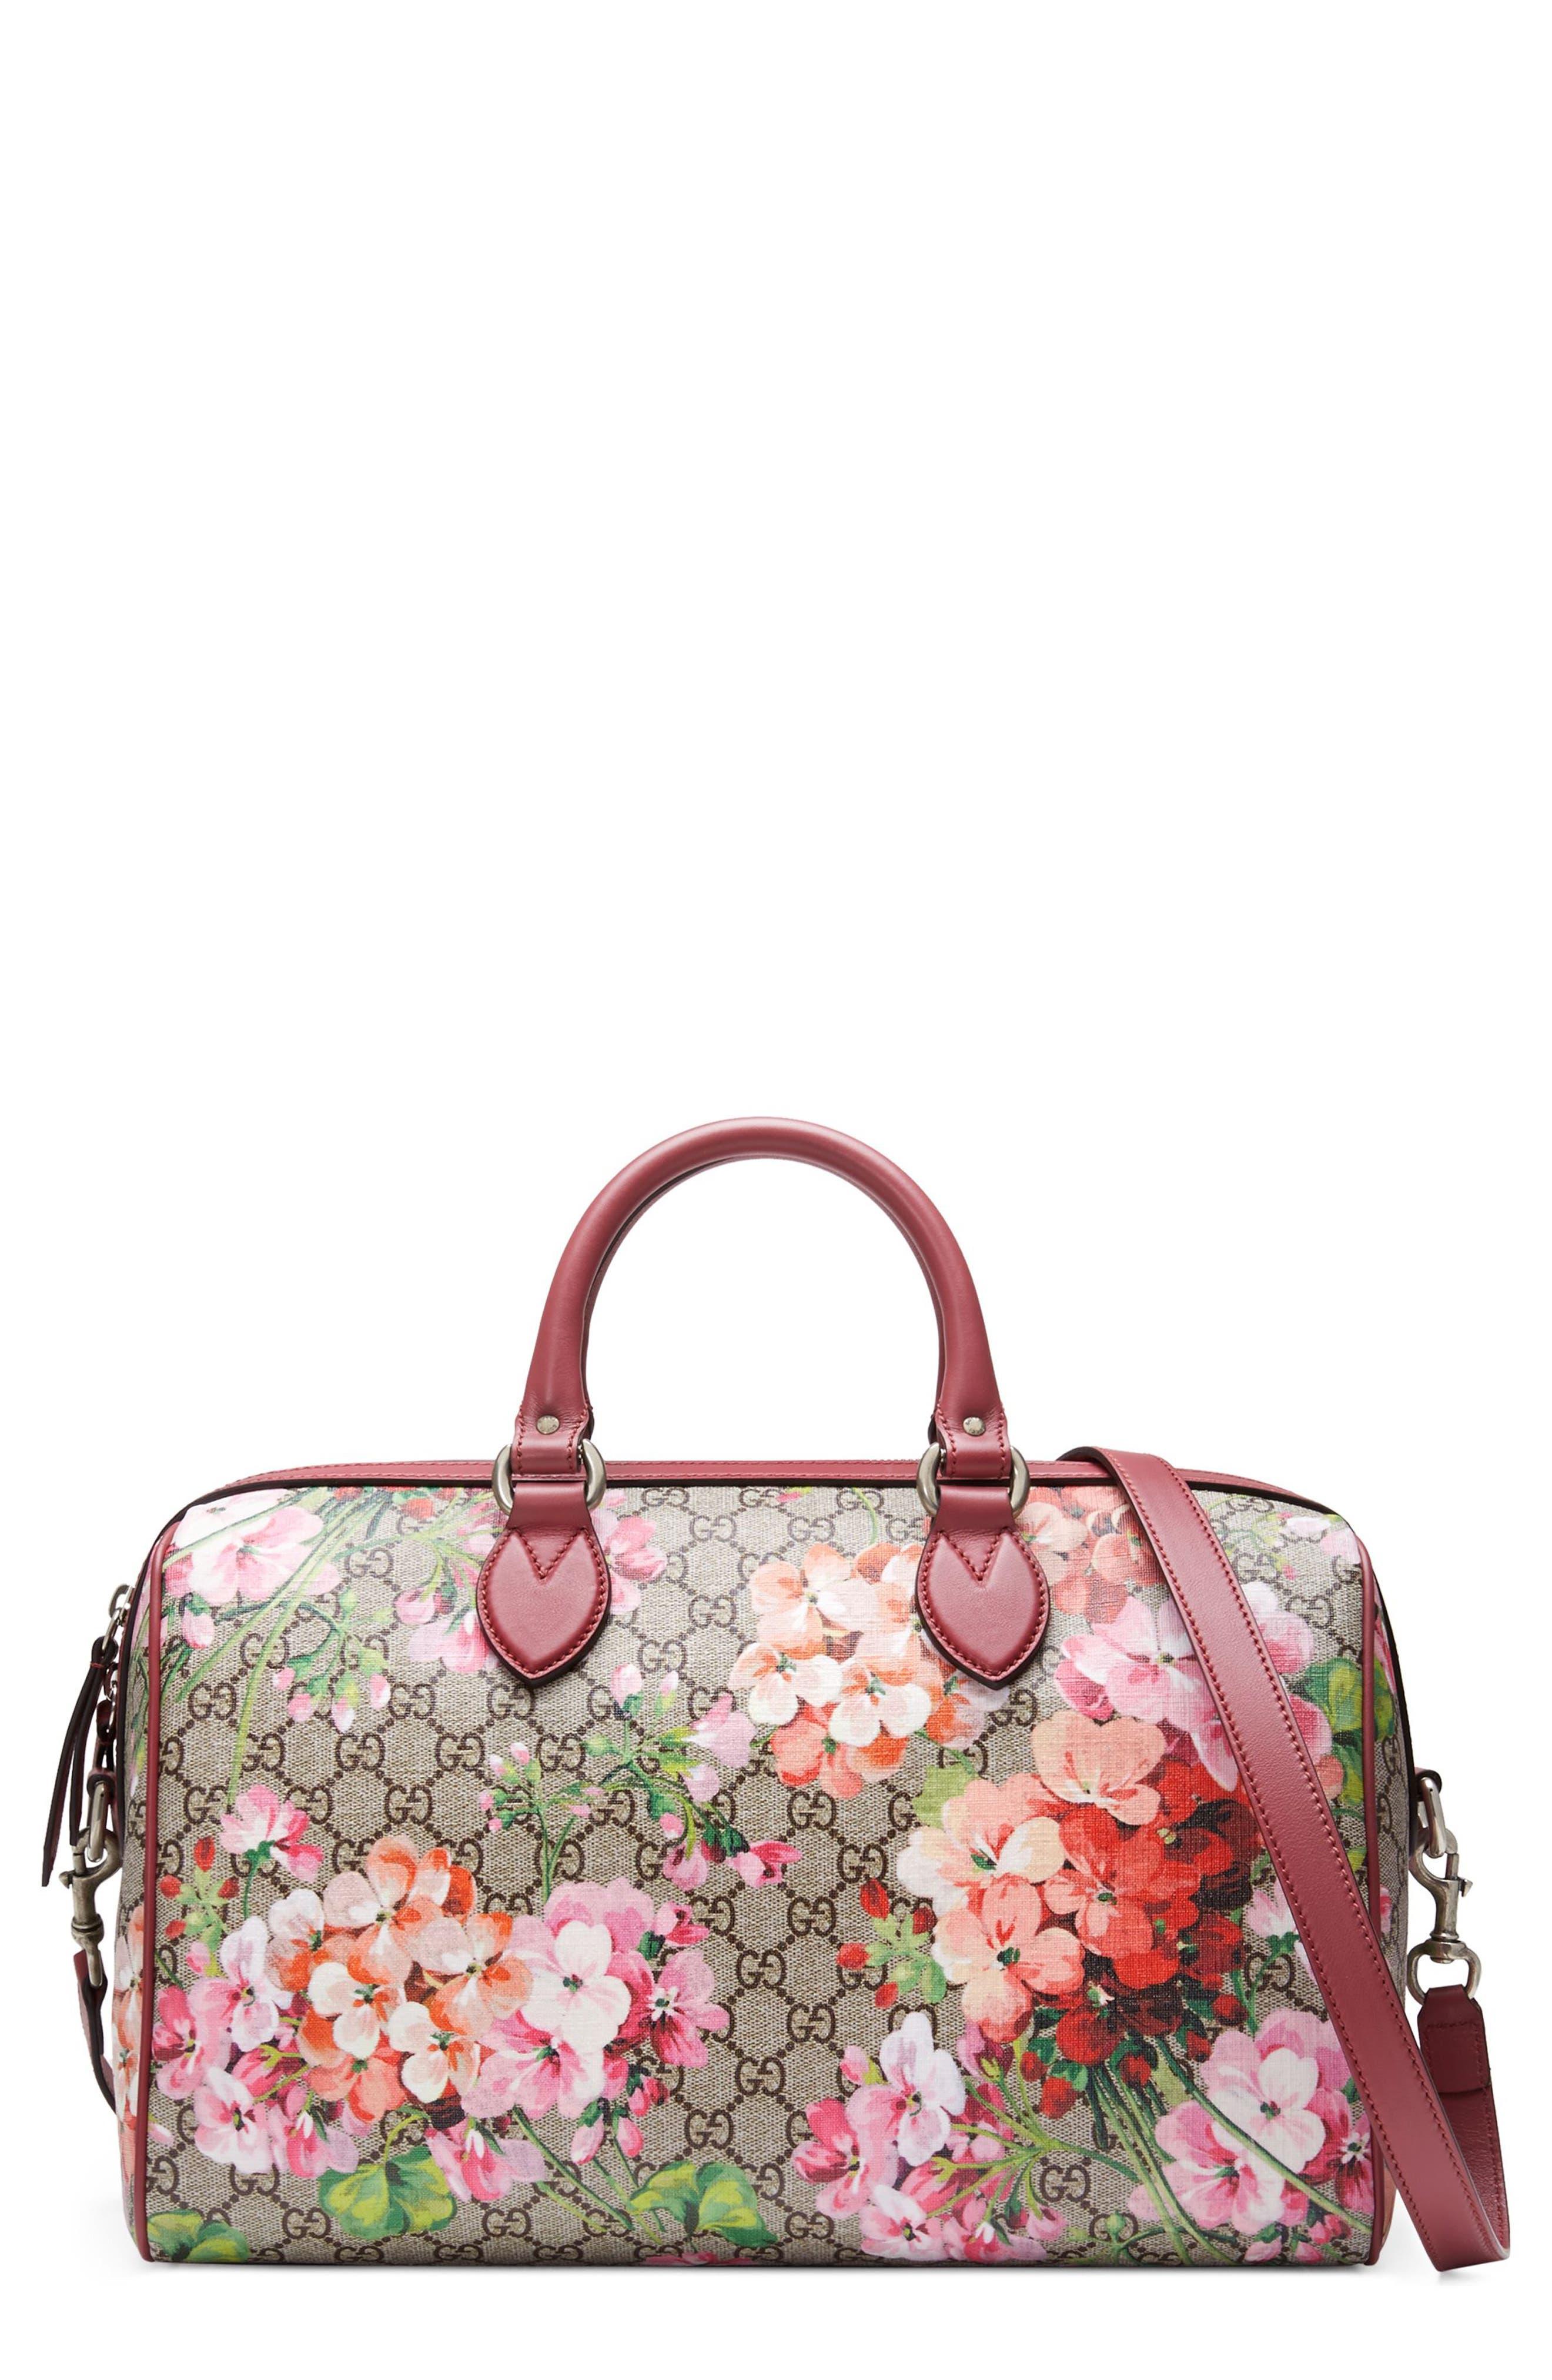 Medium Blooms GG Supreme Top Handle Canvas Bag,                         Main,                         color, 250